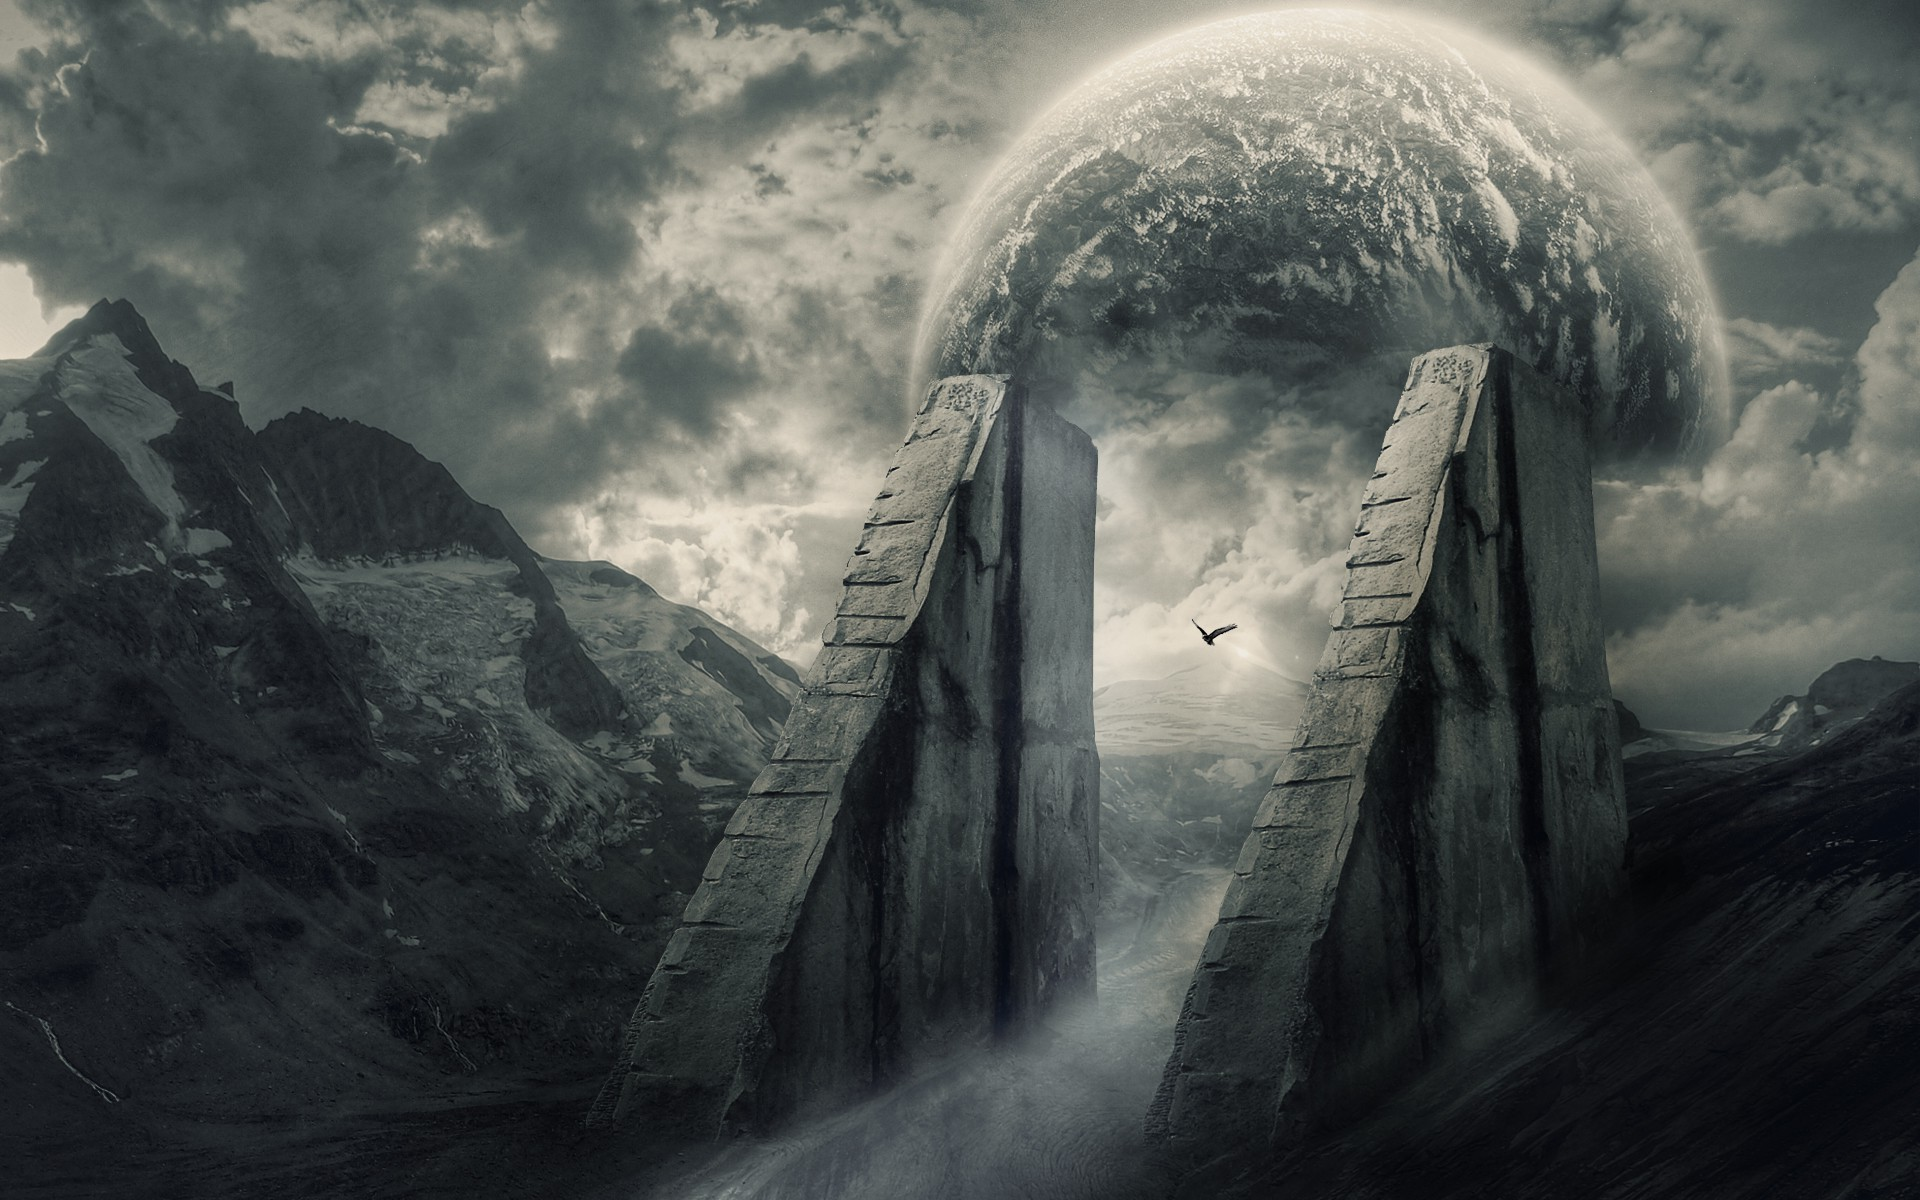 God Of War Mobile Wallpaper Hd 1080p Dark Fantasy Wallpaper 79 Images